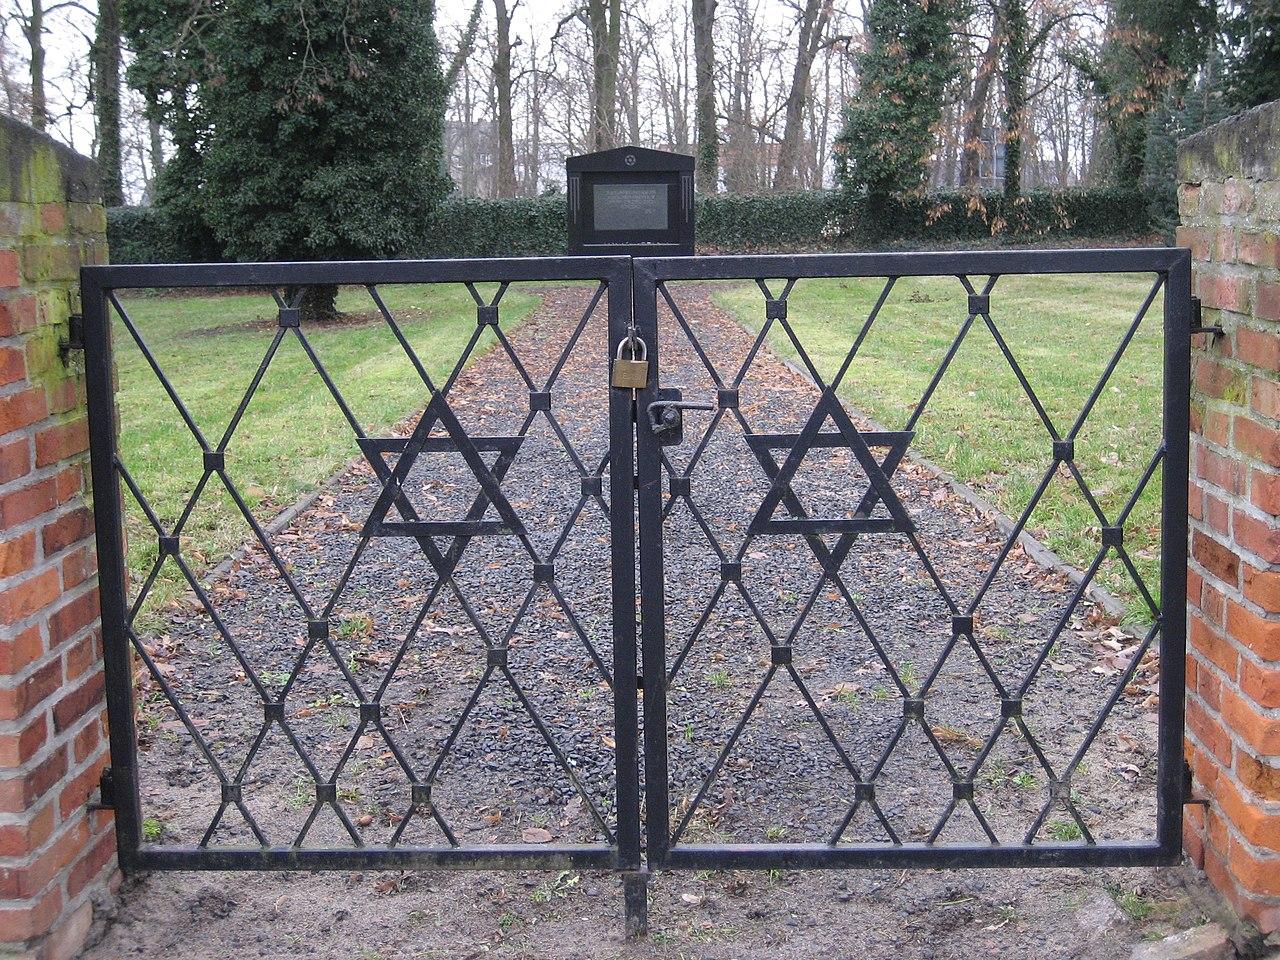 Pasewalk-Jüdischer-Friedhof-Torweg-IMG 6190.JPG